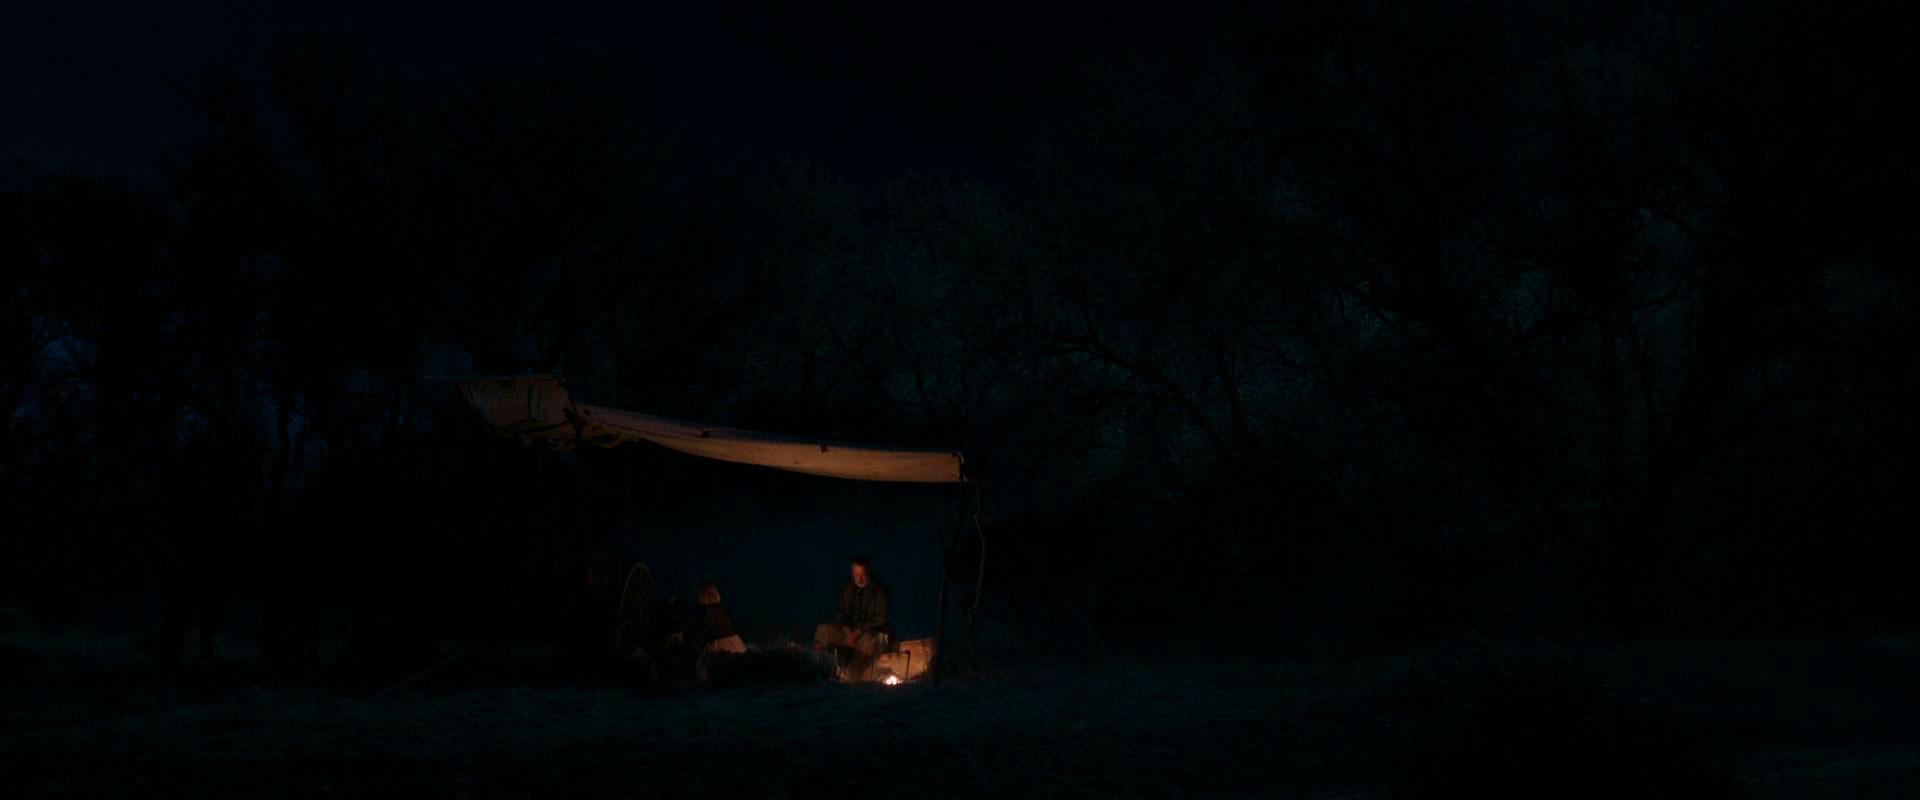 Splitscreen-review Image de La Mission de Paul Greengrass